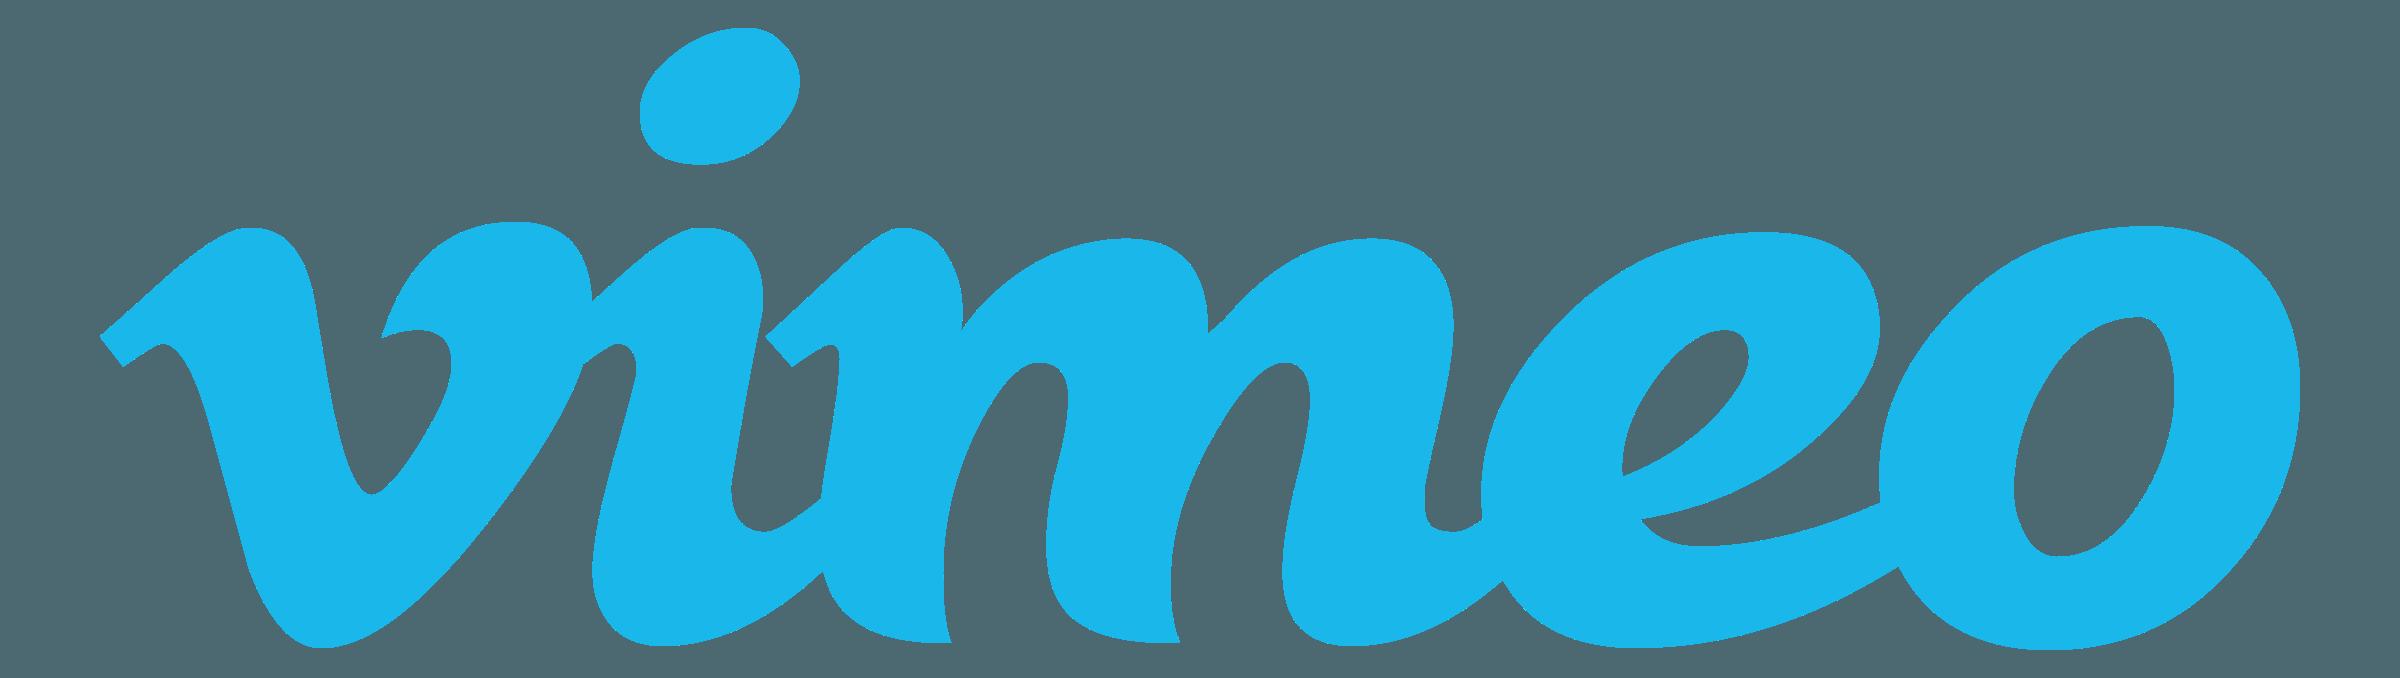 Vimeo SEO Services - Logo